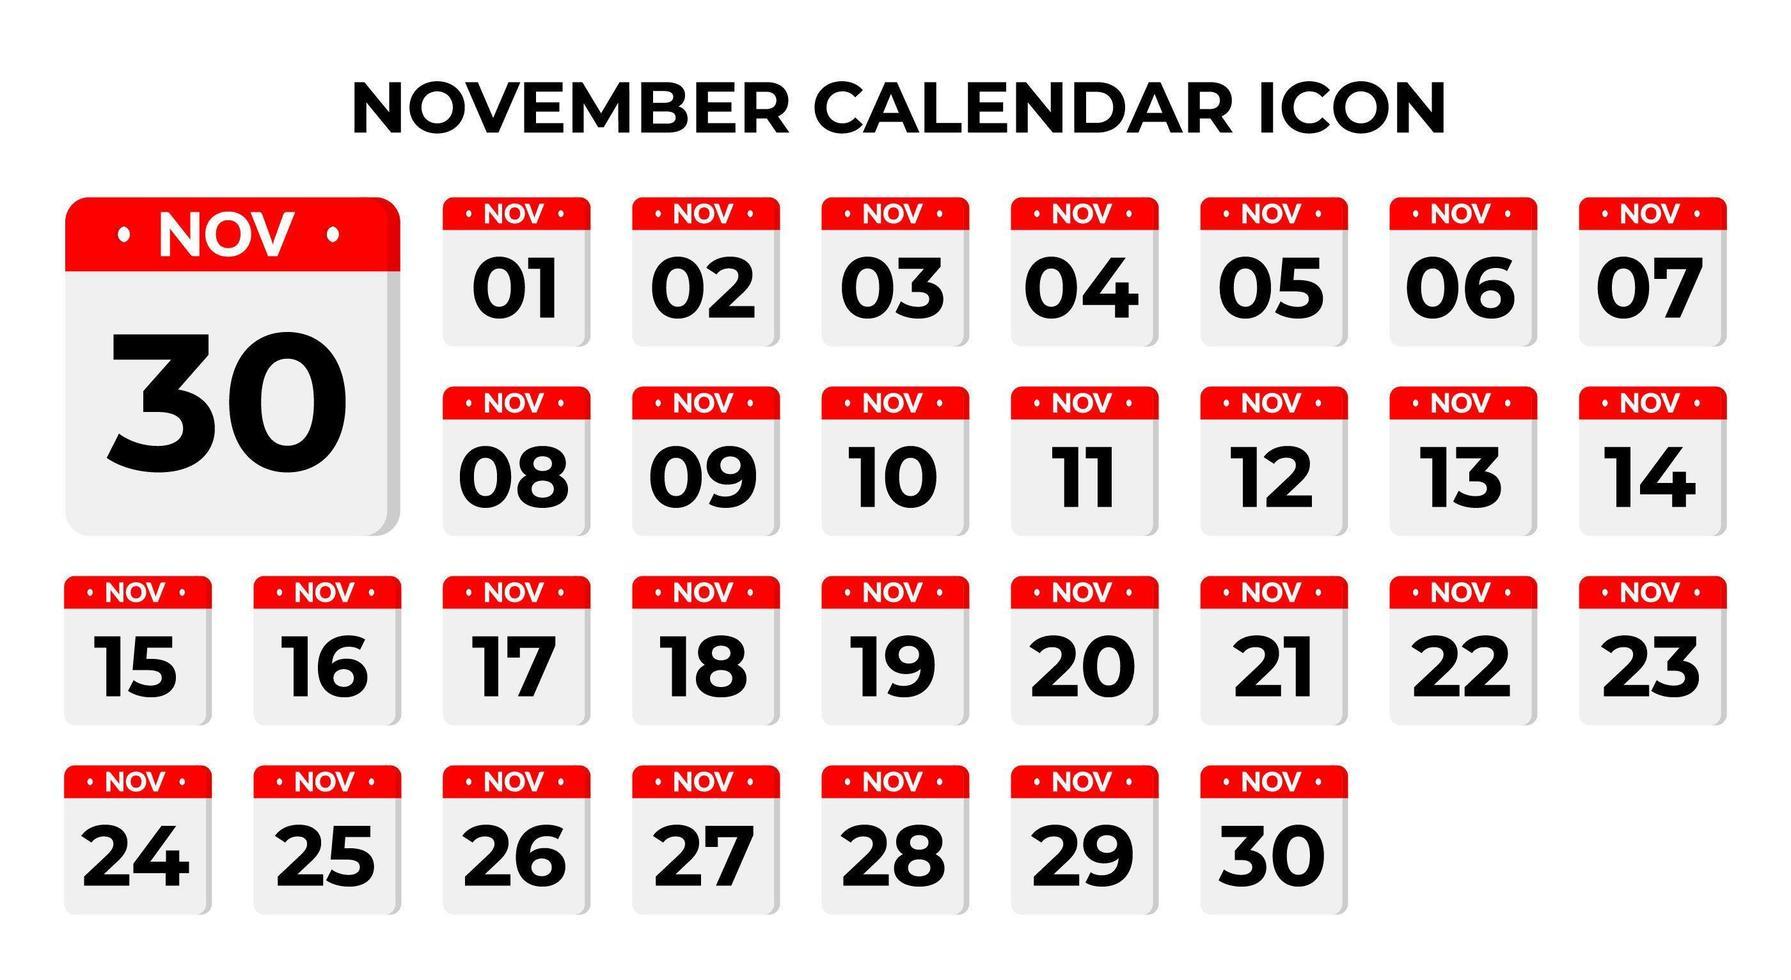 iconos de calendario de noviembre vector